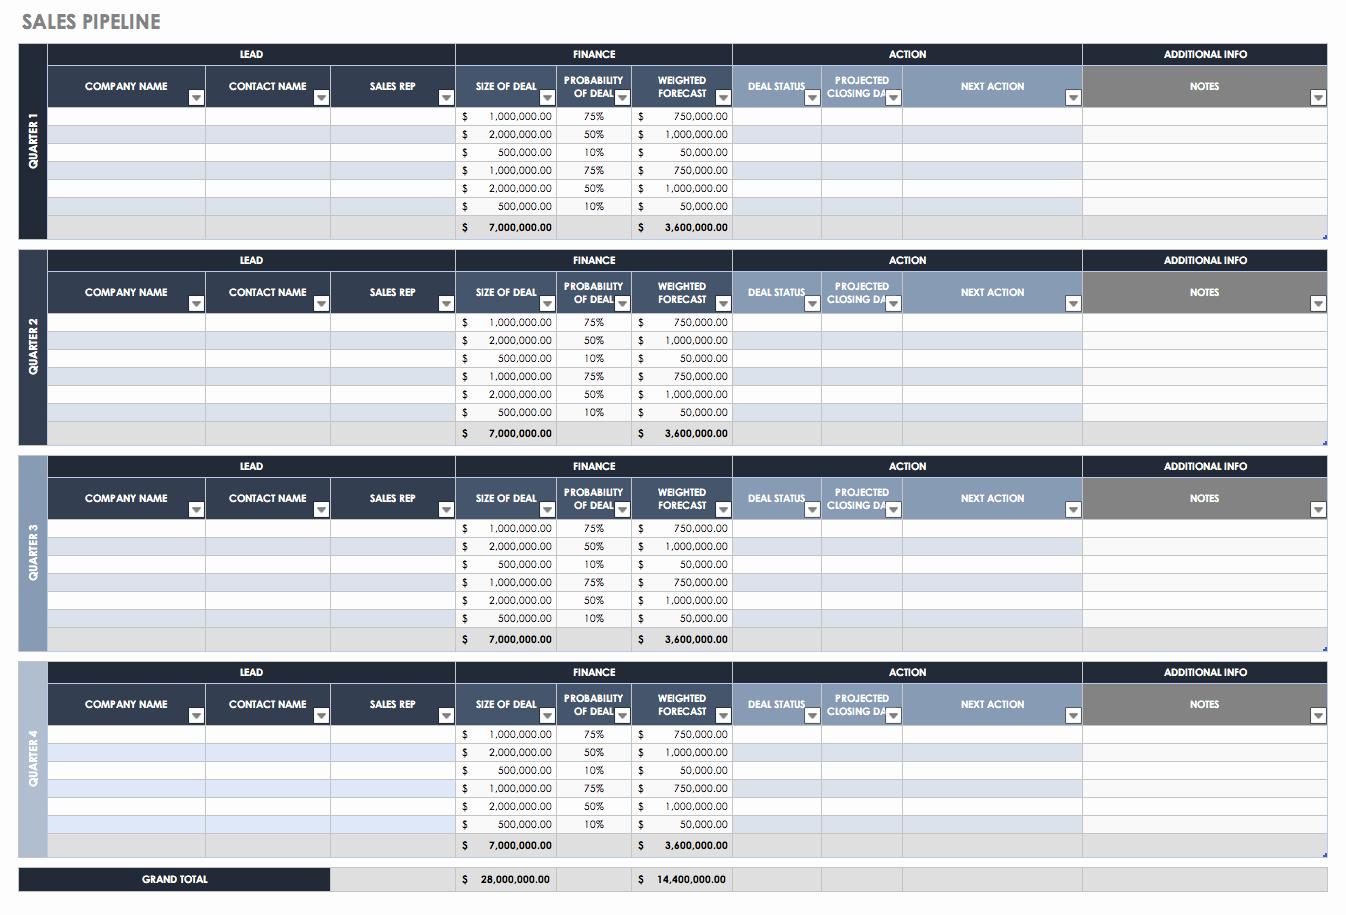 Sales Leads Excel Template Unique Free Sales Pipeline Templates